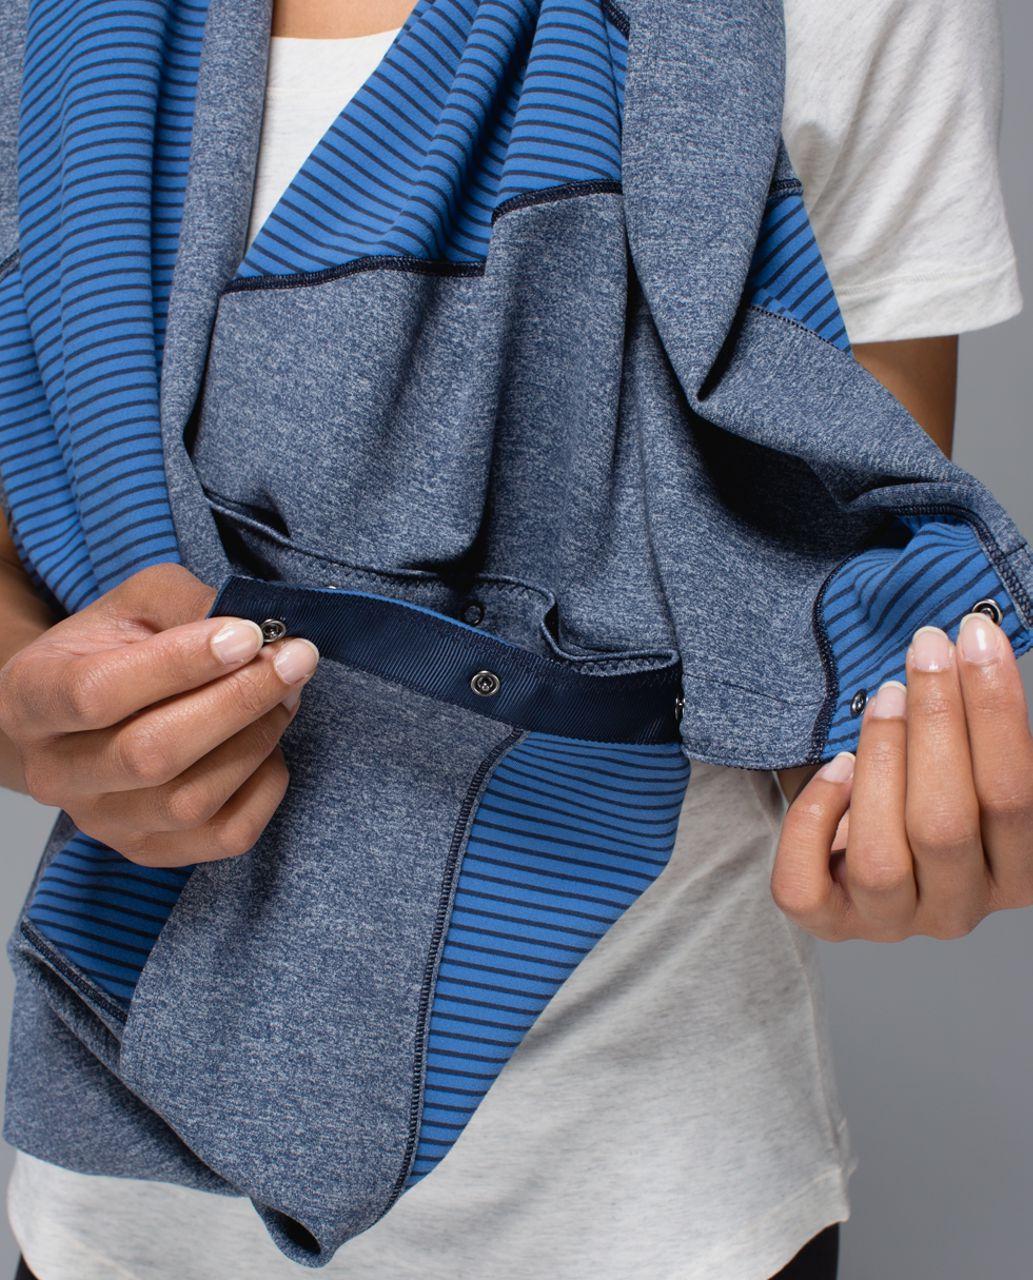 Lululemon Vinyasa Scarf *Quilt - Hyper Stripe Inkwell Rugged Blue / Heathered Inkwell